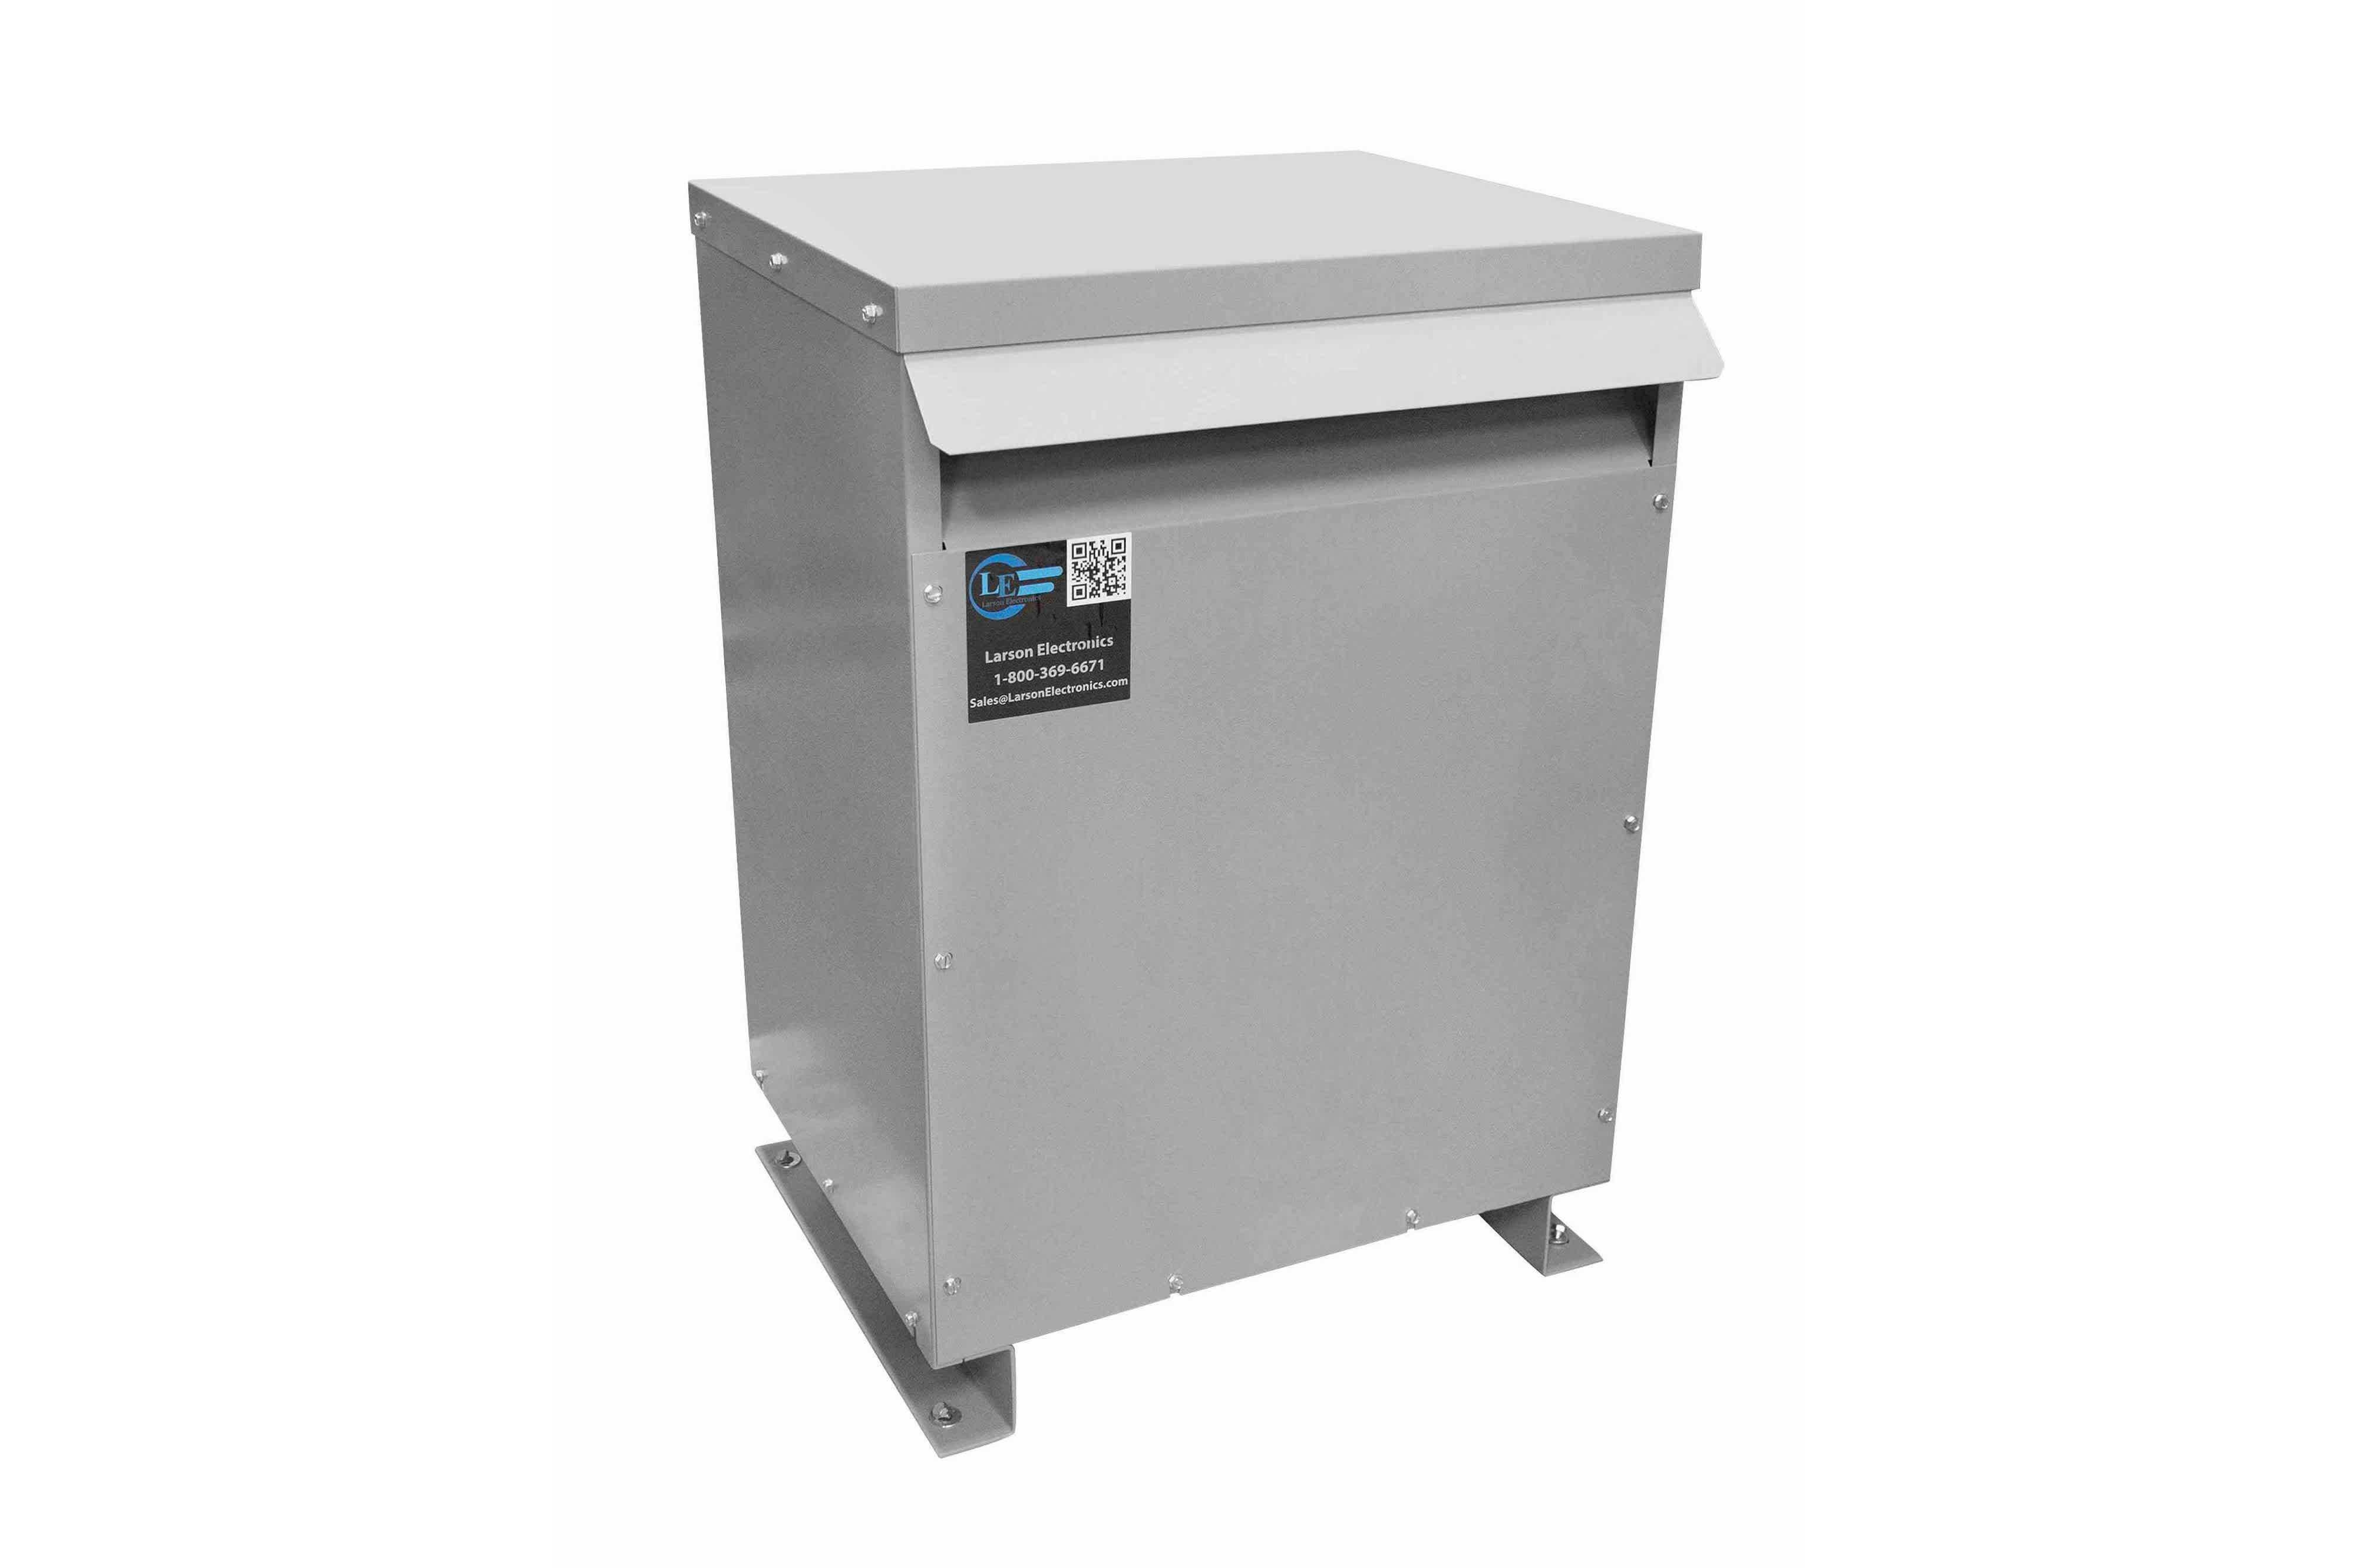 42.5 kVA 3PH Isolation Transformer, 415V Wye Primary, 208V Delta Secondary, N3R, Ventilated, 60 Hz